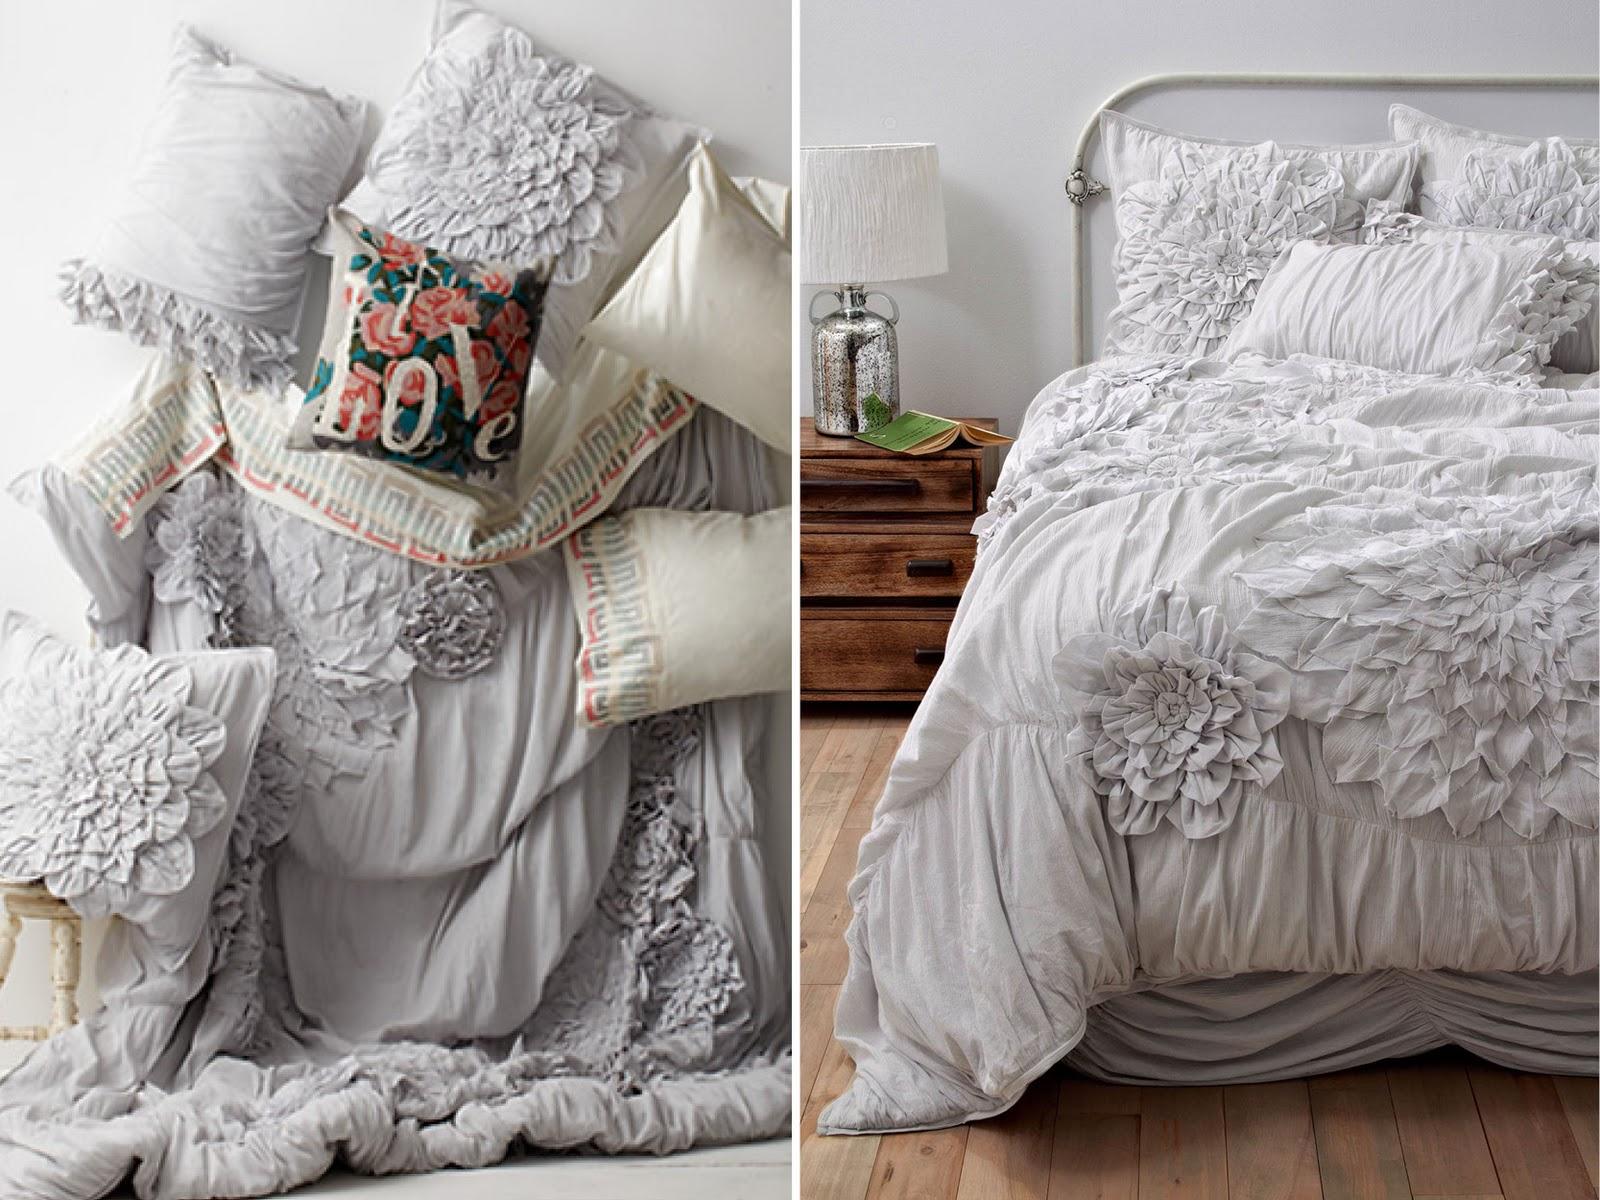 Anthropologie bedding - Bedding Bundles For Sweet Dreams